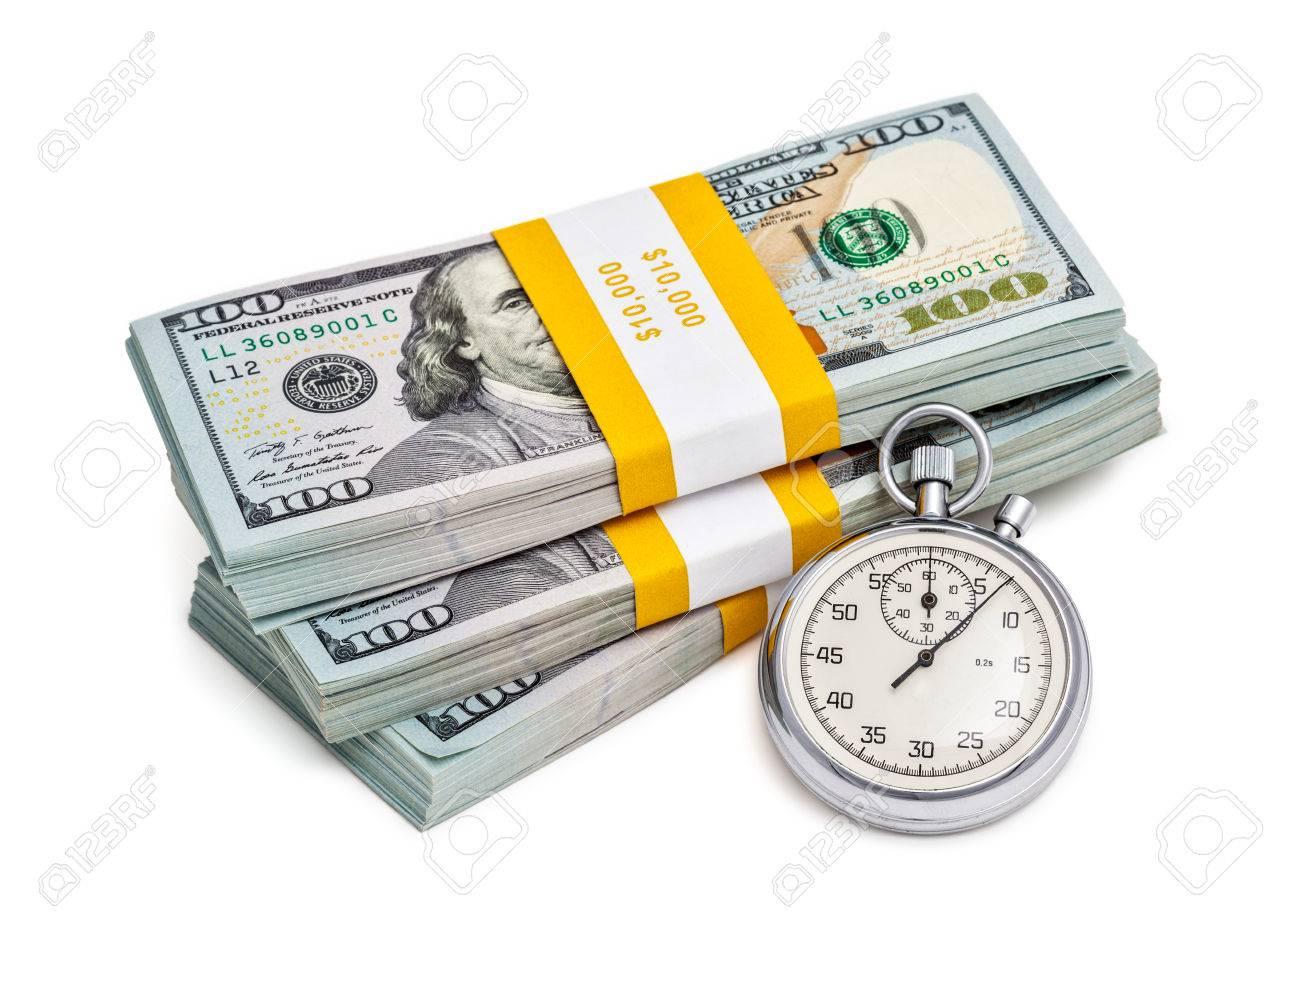 Payday loan in arlington texas photo 10